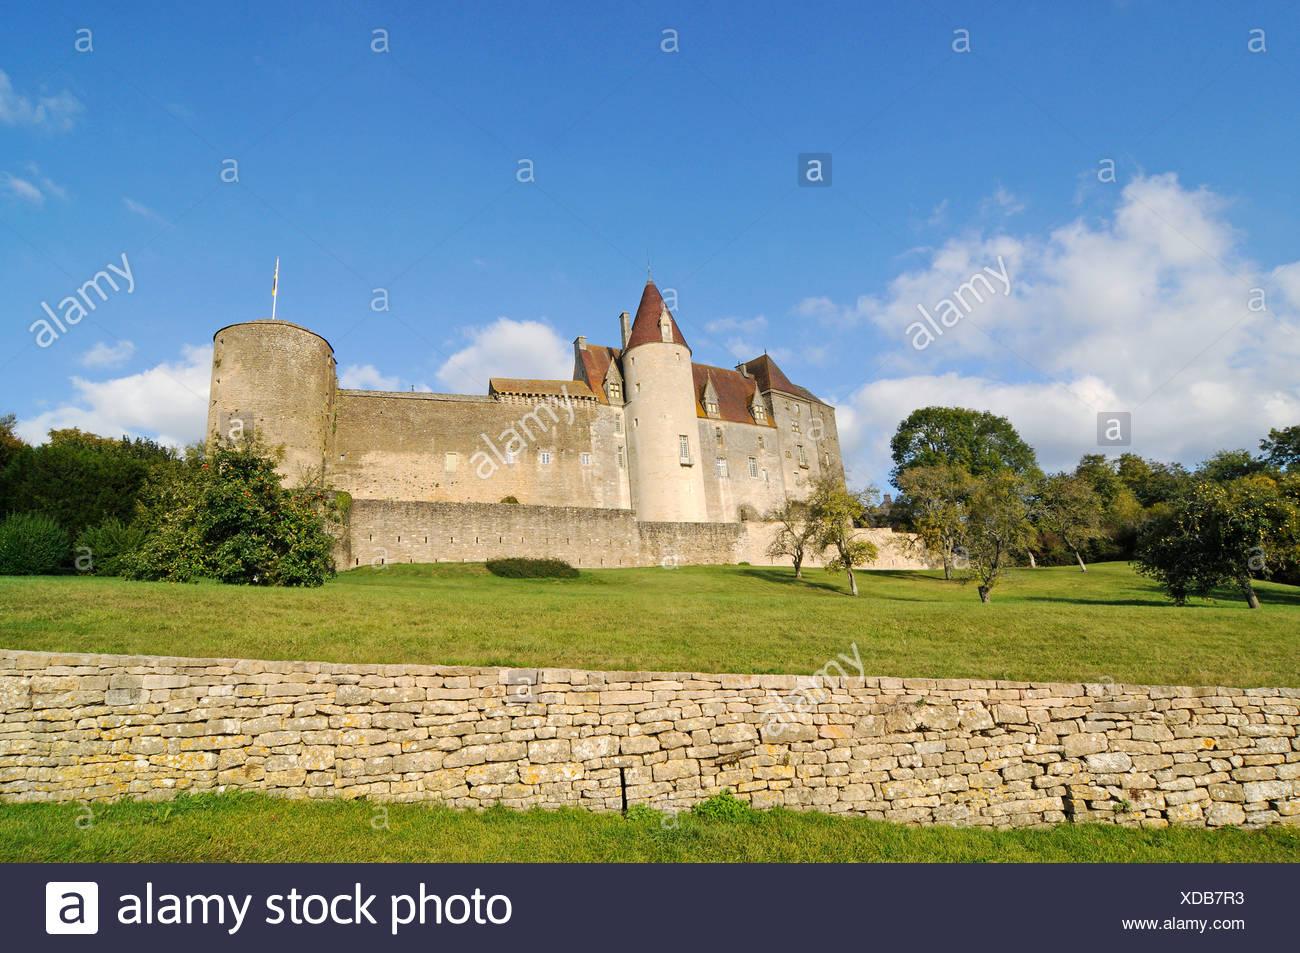 Chateau, castle, Chateauneuf, Dijon, Cote-d'Or, Bourgogne, Burgundy, France, Europe, PublicGround Stock Photo